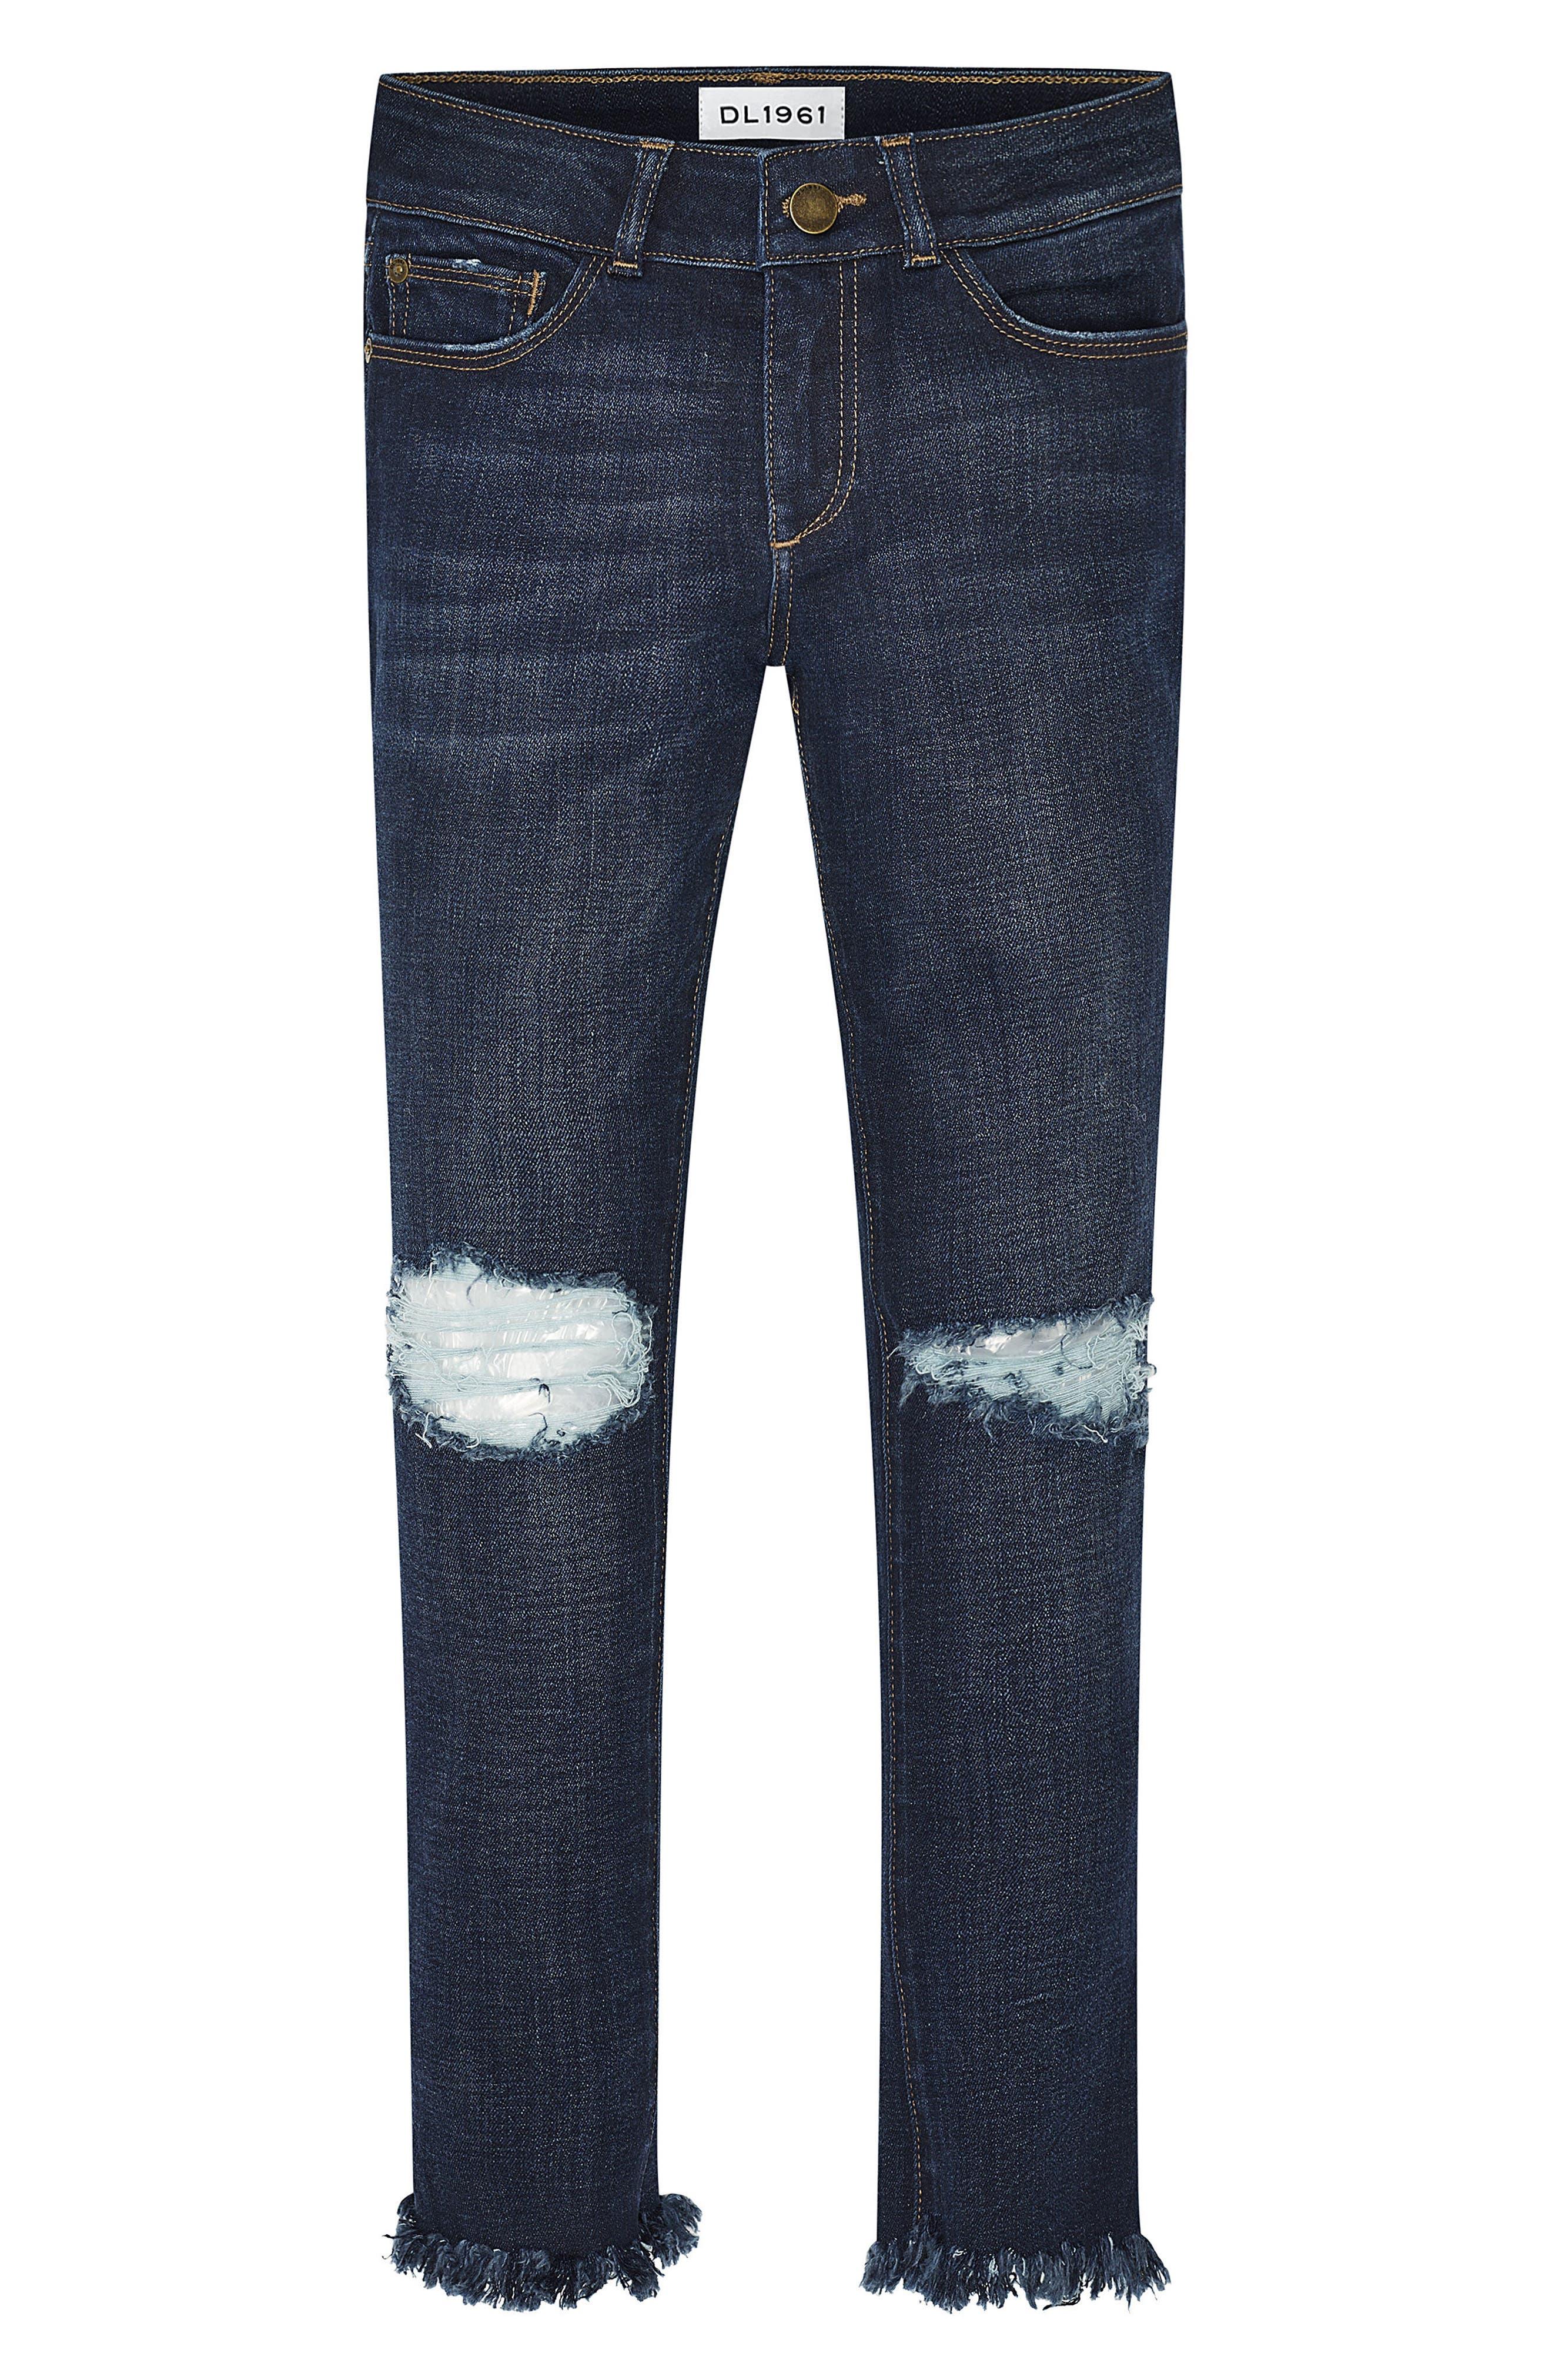 DL1916 Chloe Distressed Skinny Jeans (Big Girls)